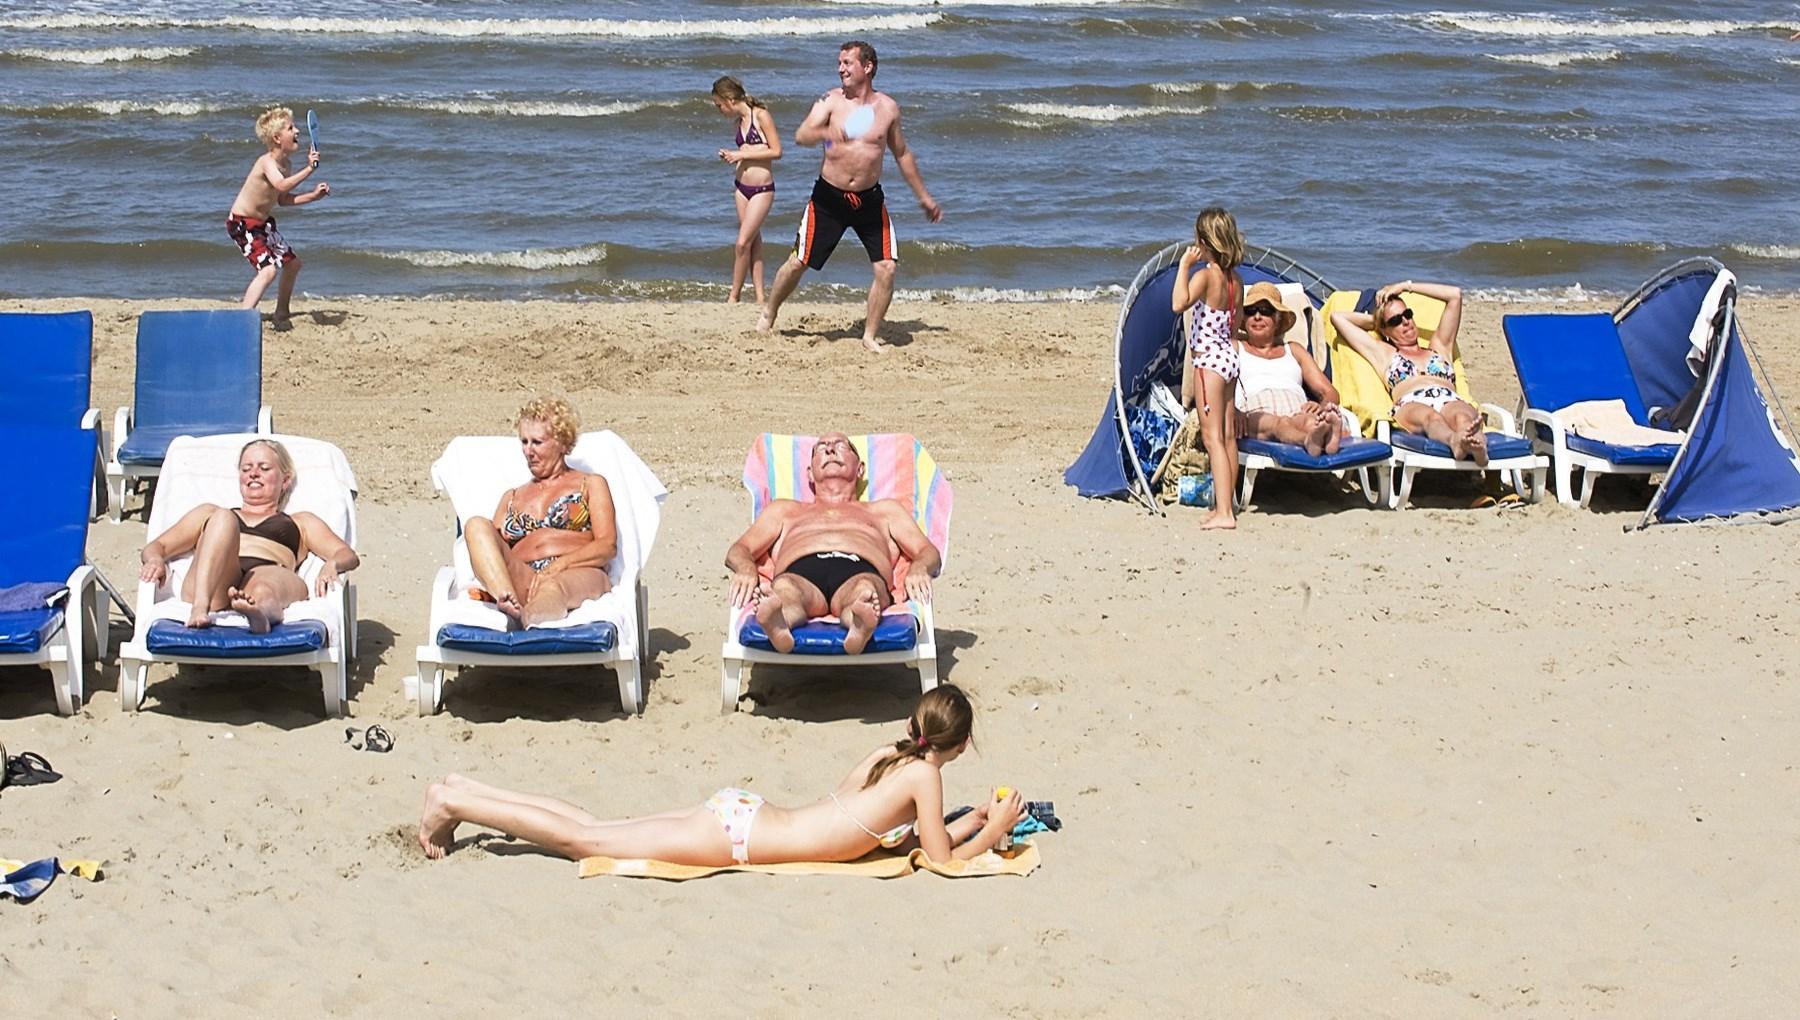 Top 10 Best Beaches in Netherlands